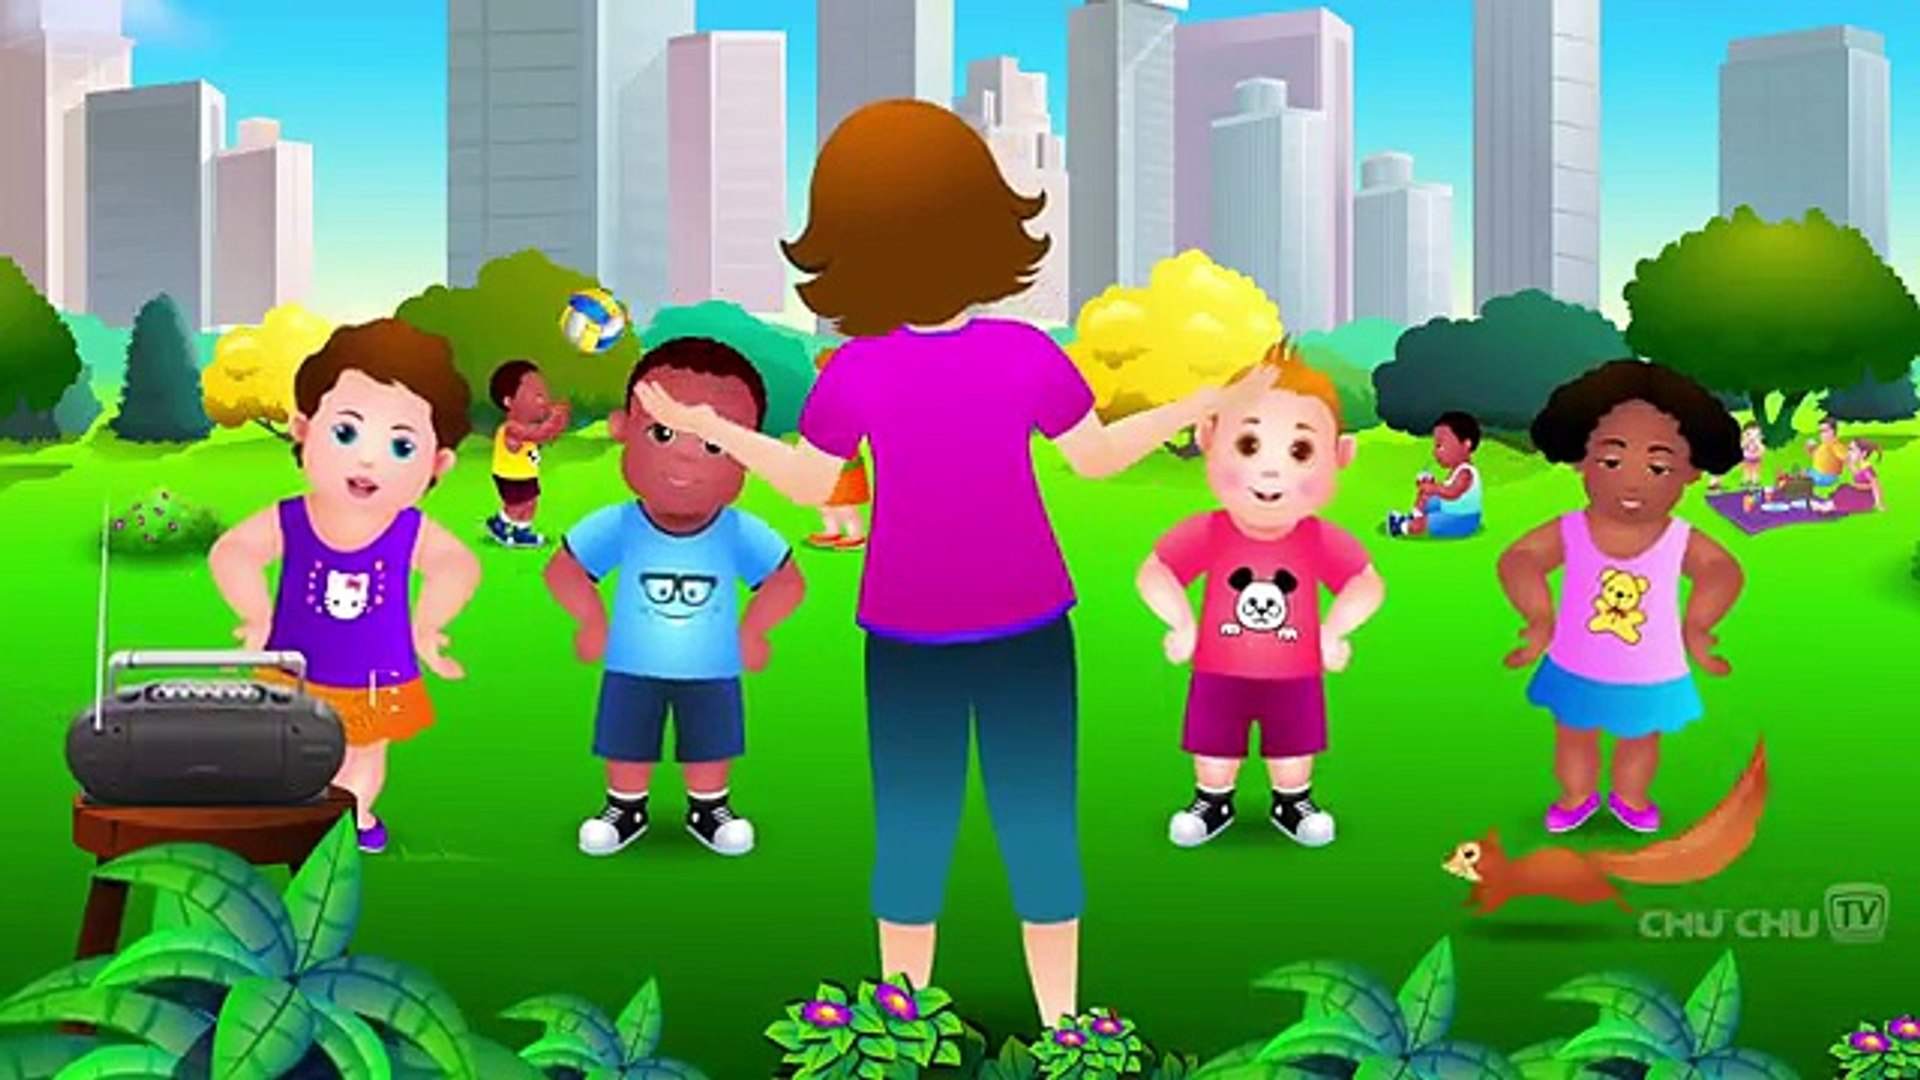 Song Kid ( Exercise) Aerobics Music, Kid sing song